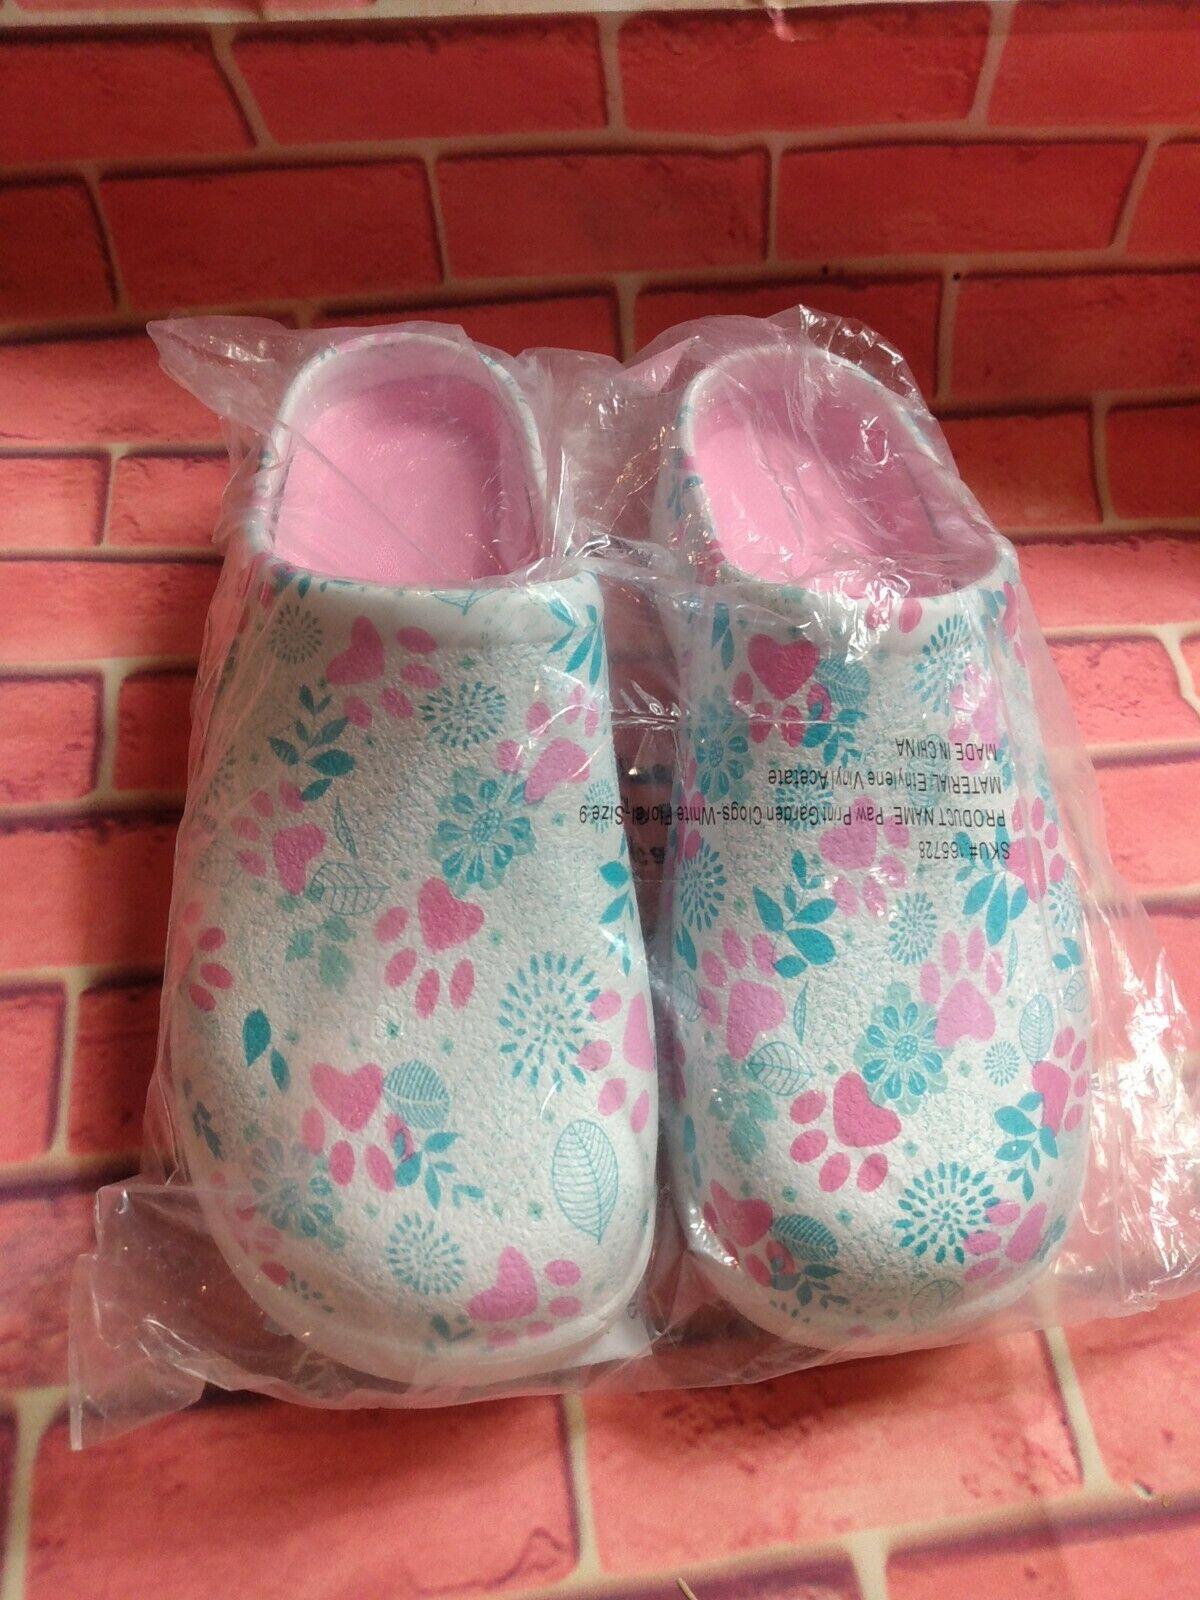 Paw Print Rain Barn Garden Clog Shoes Womens SZ 9 white floral